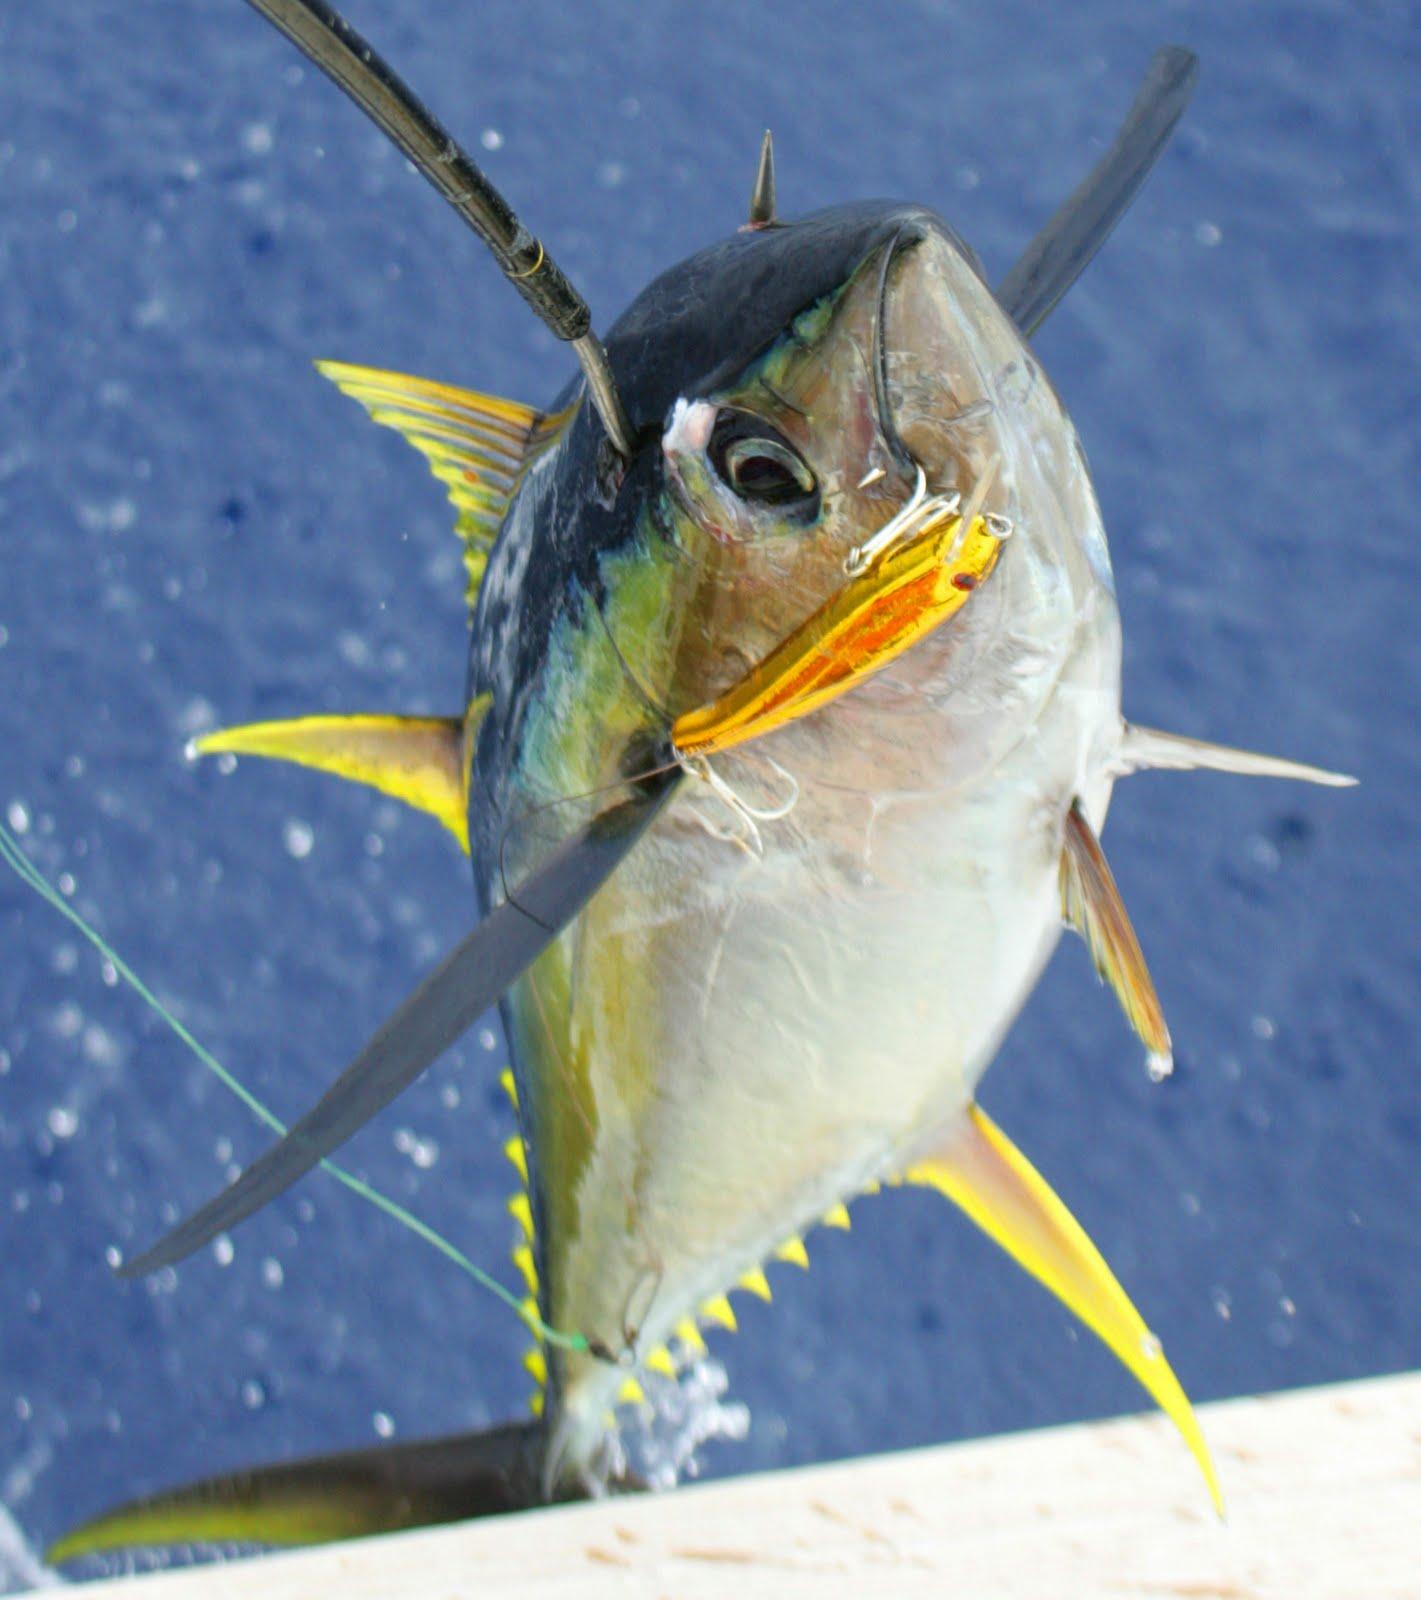 Tropical affair fishing with new 2012 penn reel for for Ahi tuna fish